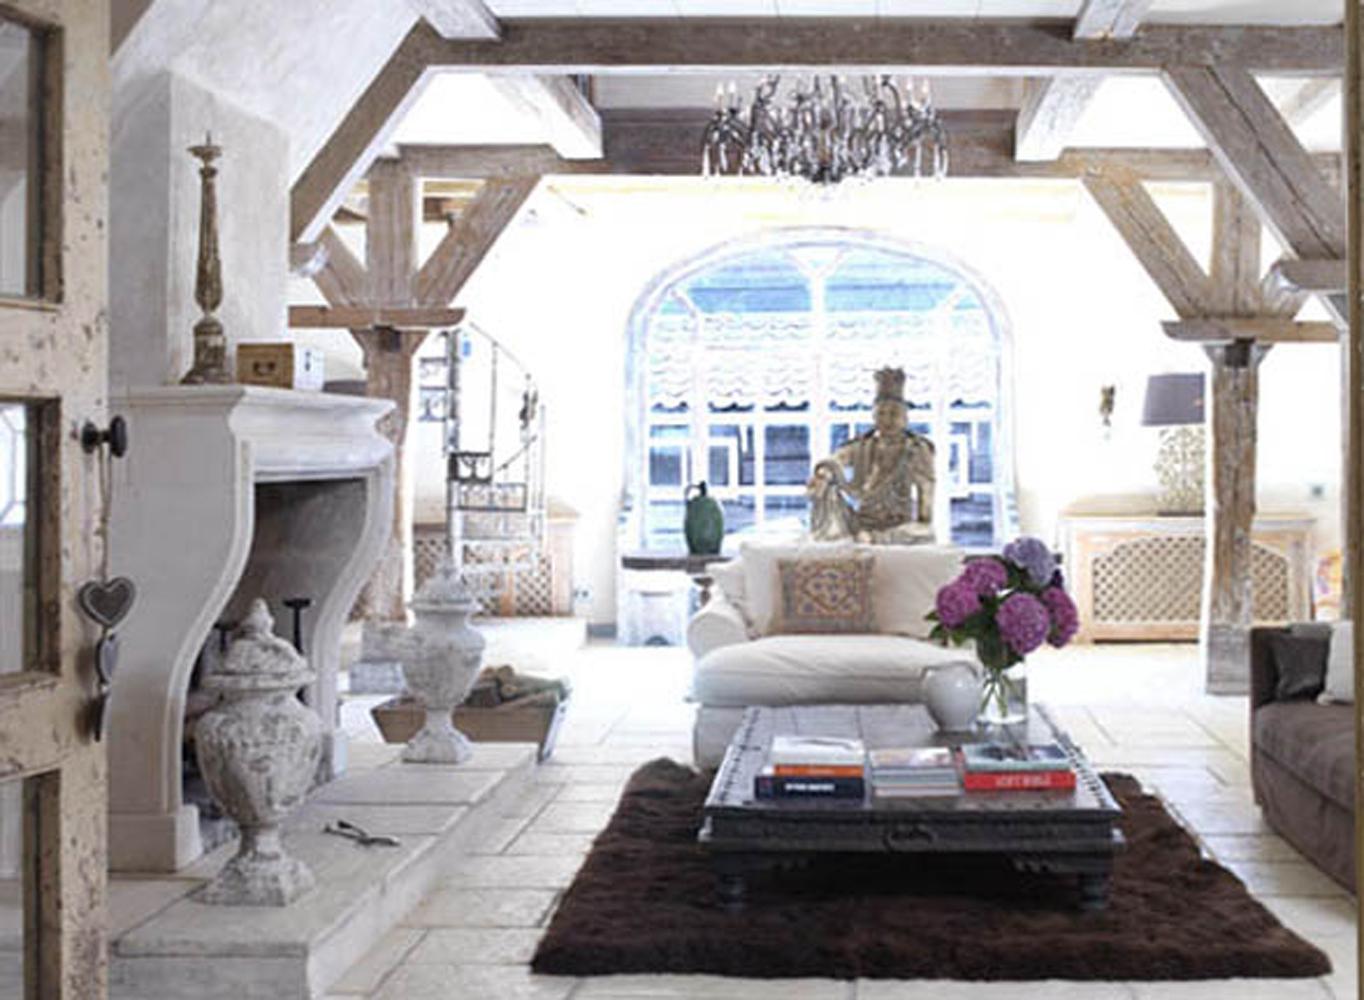 Peter korver amsterdam fine art interiorworks pearl of earth - Interieur eigentijds houten huis ...